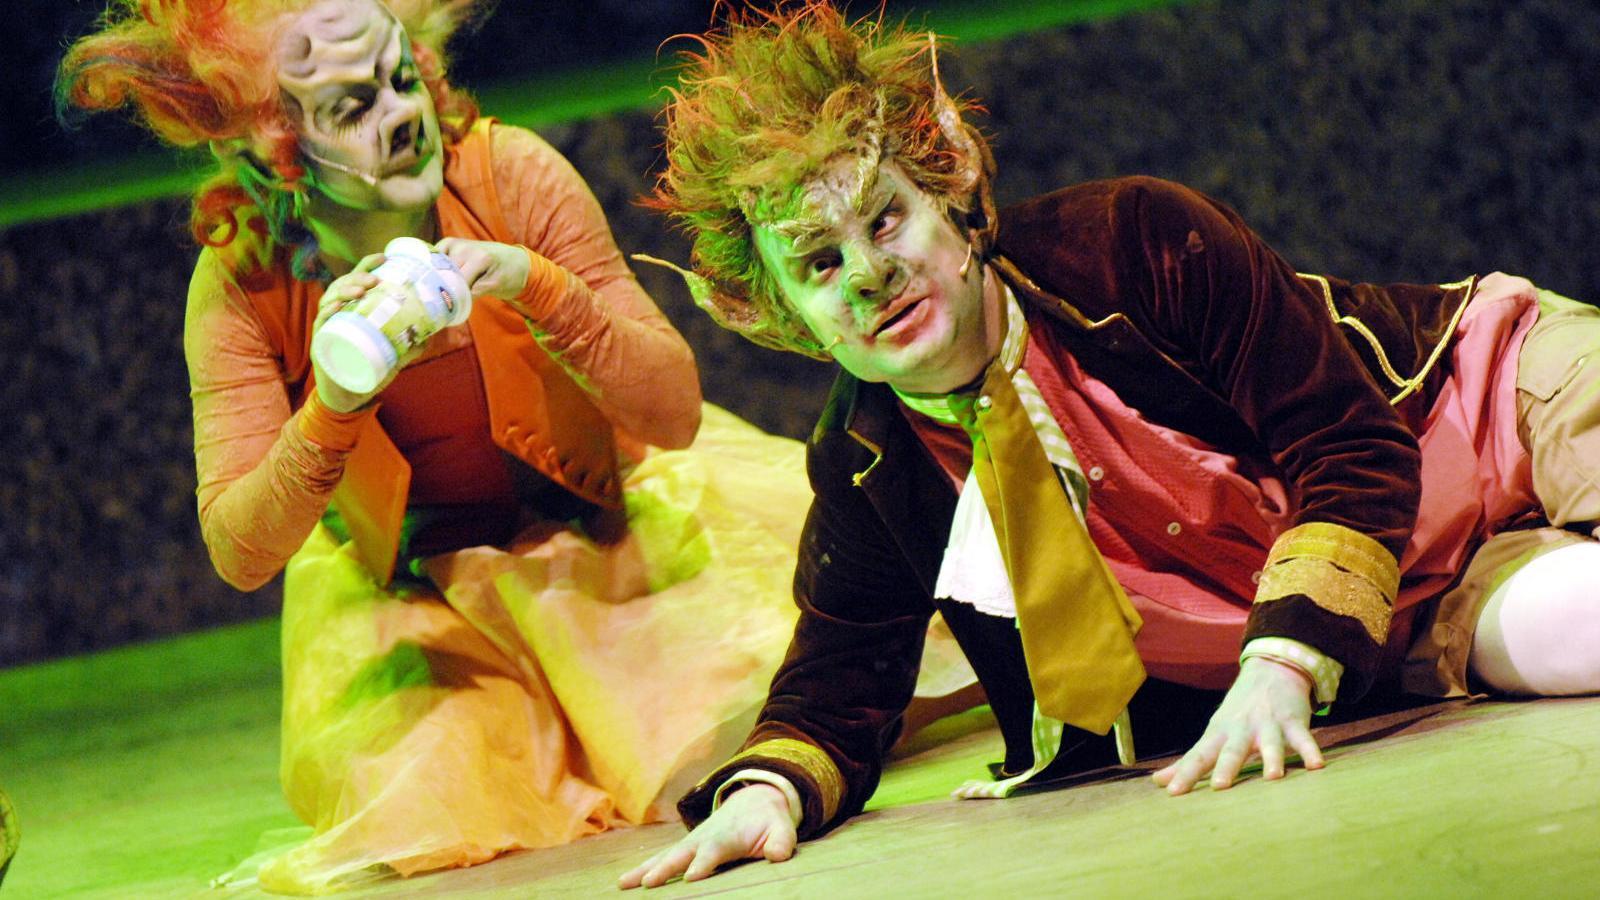 Mainfrankentheater Würzburg zieht Bilanz